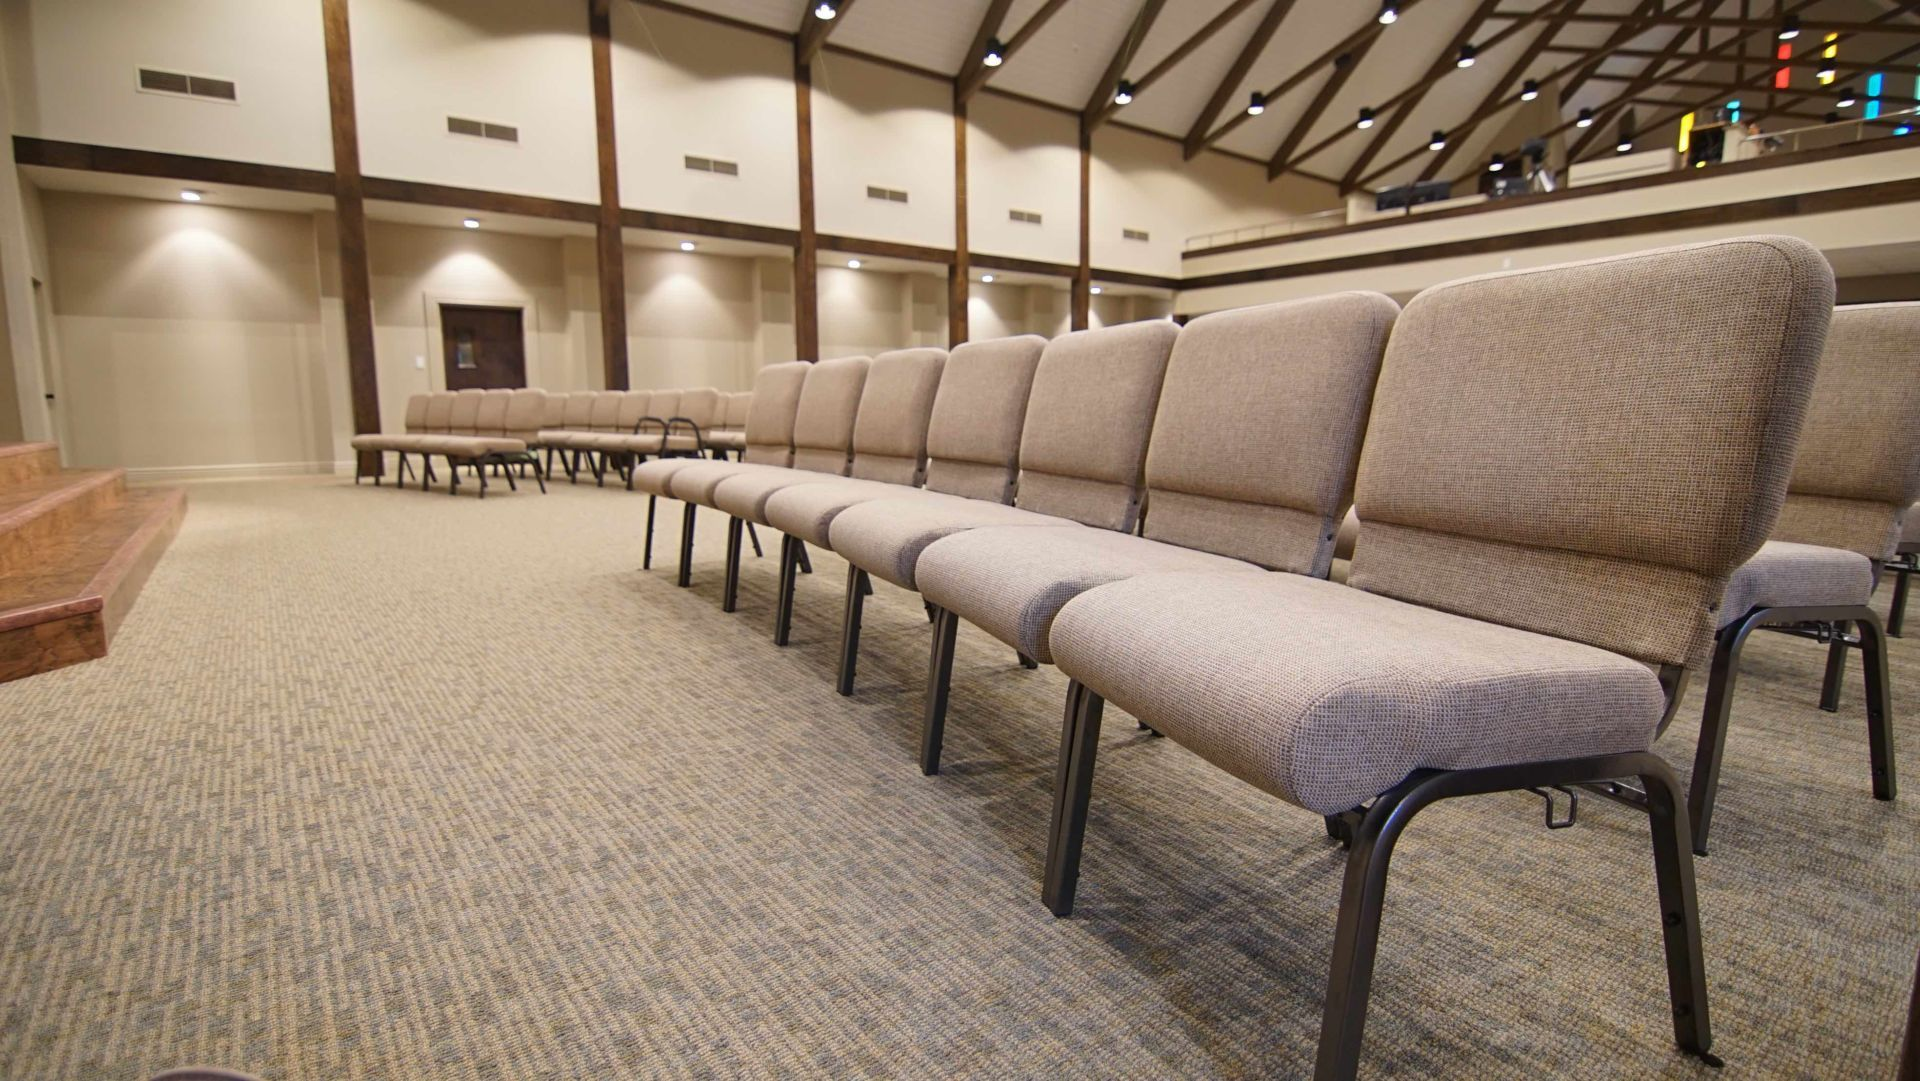 Event Carpet Supplier Malaysia Exhibition Carpet Tile Roll In 2020 Carpet Tiles Church Furniture Church Interior